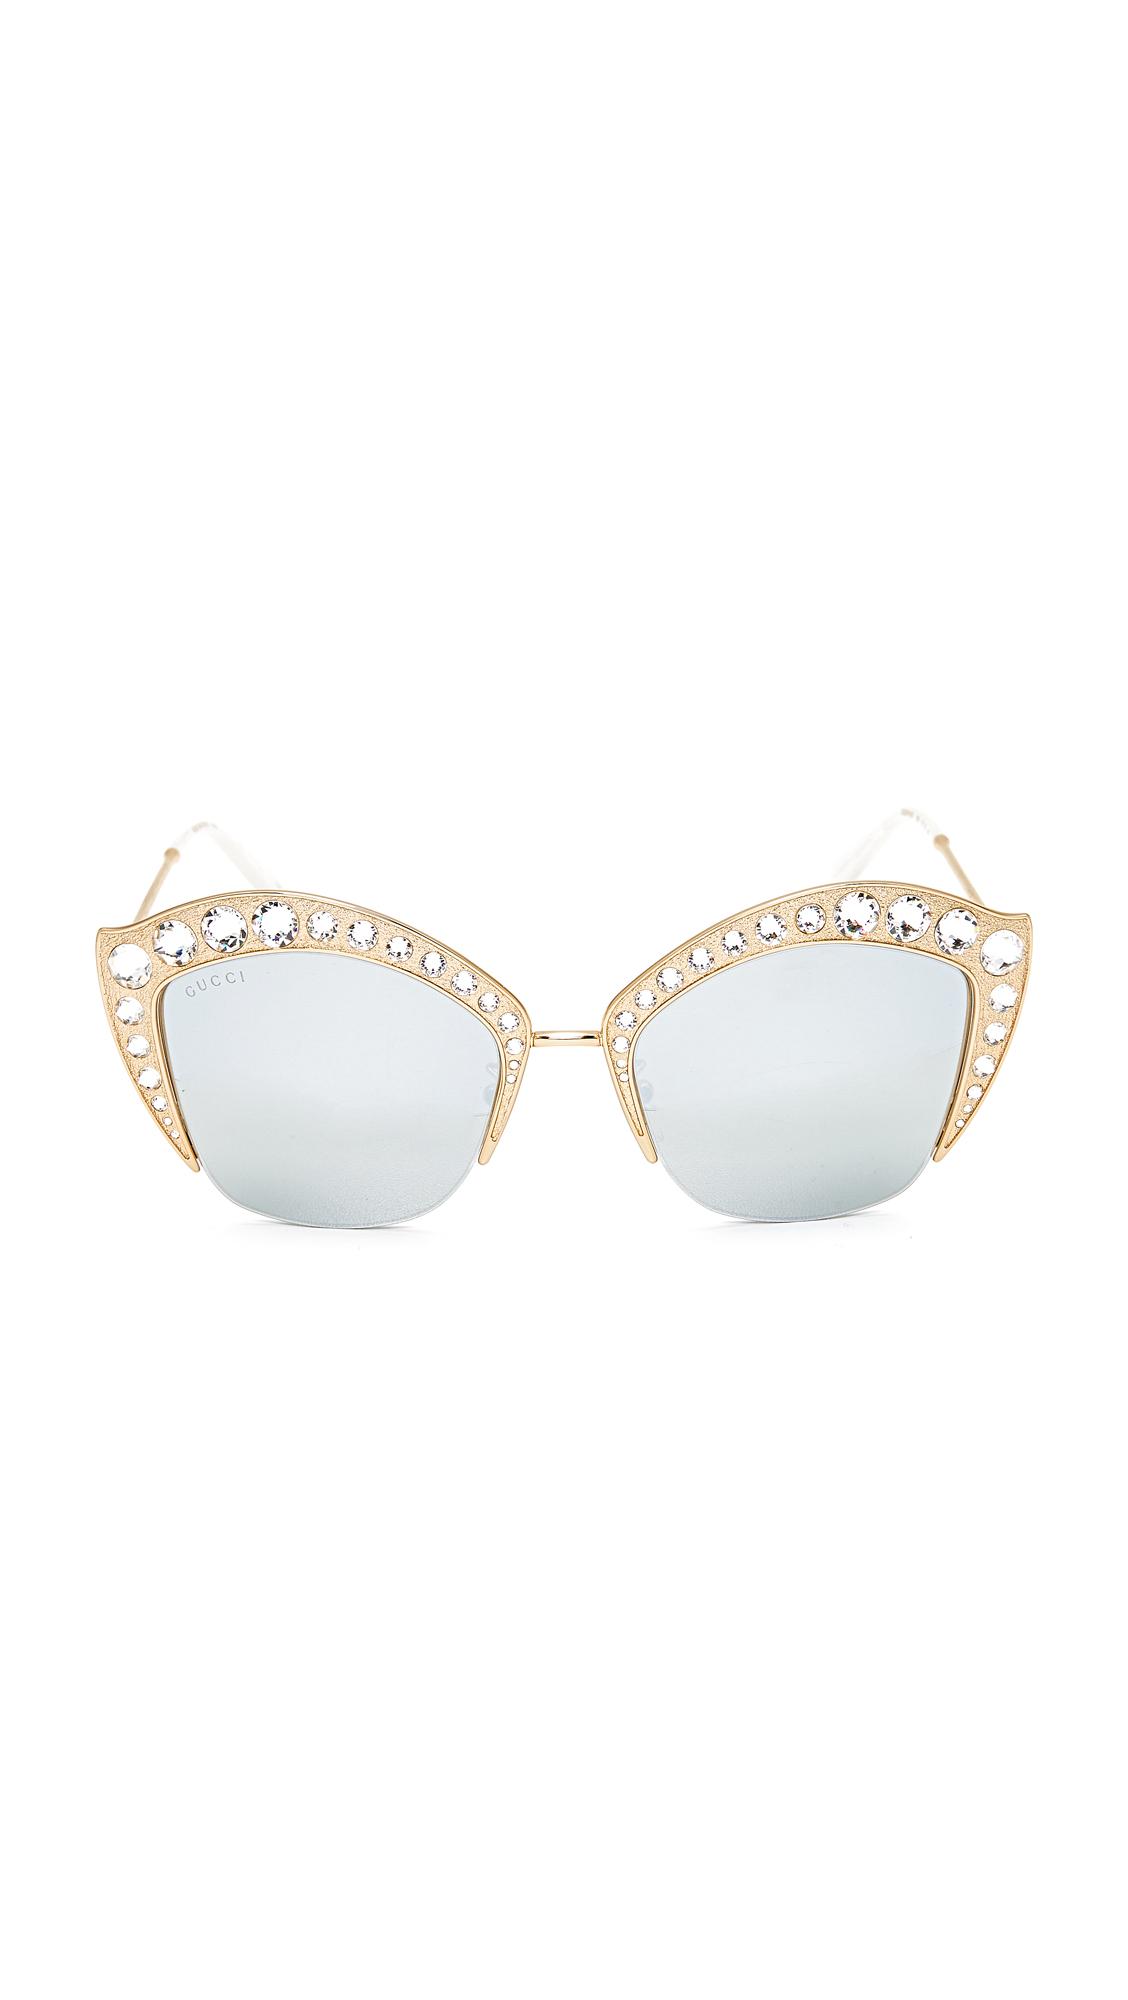 3d64c58bb80 Gucci Swarovski Crystal Cat Eye Sunglasses